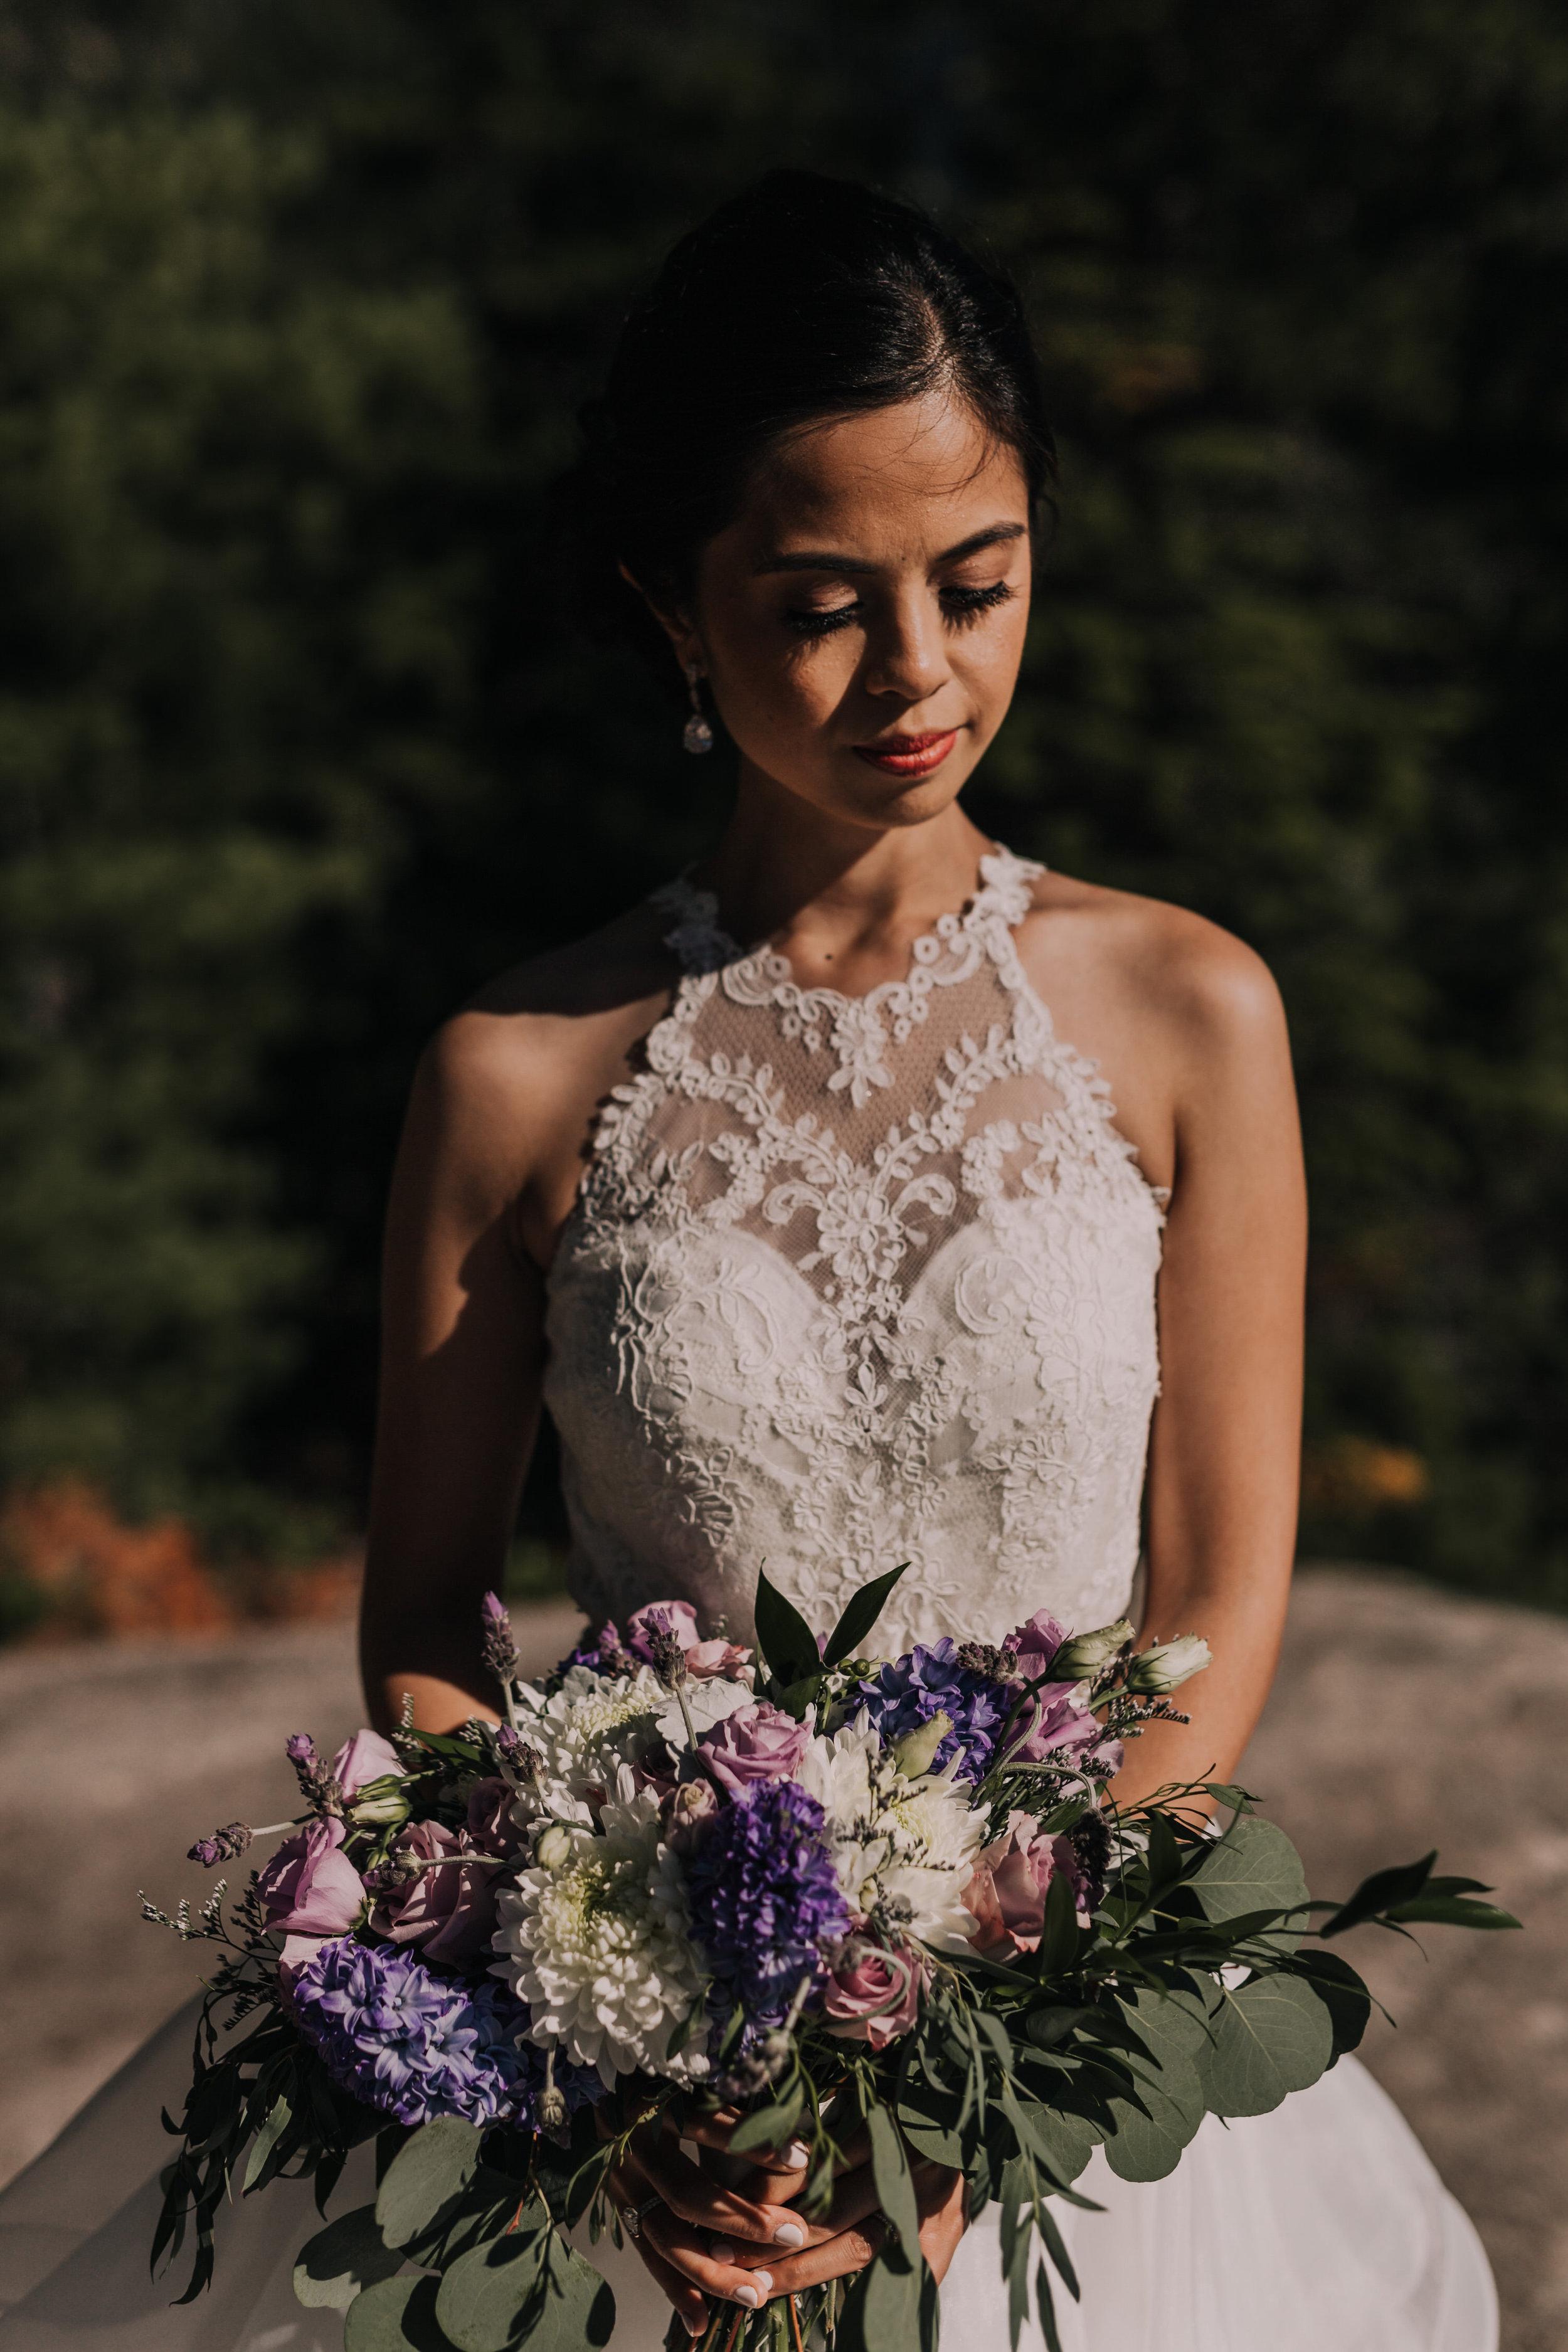 Squamish Wedding Photographer - Sea to Sky Gondola Wedding Photos -  Vancouver Wedding Photographer & Videographer - Sunshine Coast Wedding Photos - Sunshine Coast Wedding Photographer - Jennifer Picard Photography - IMG_3903.jpg